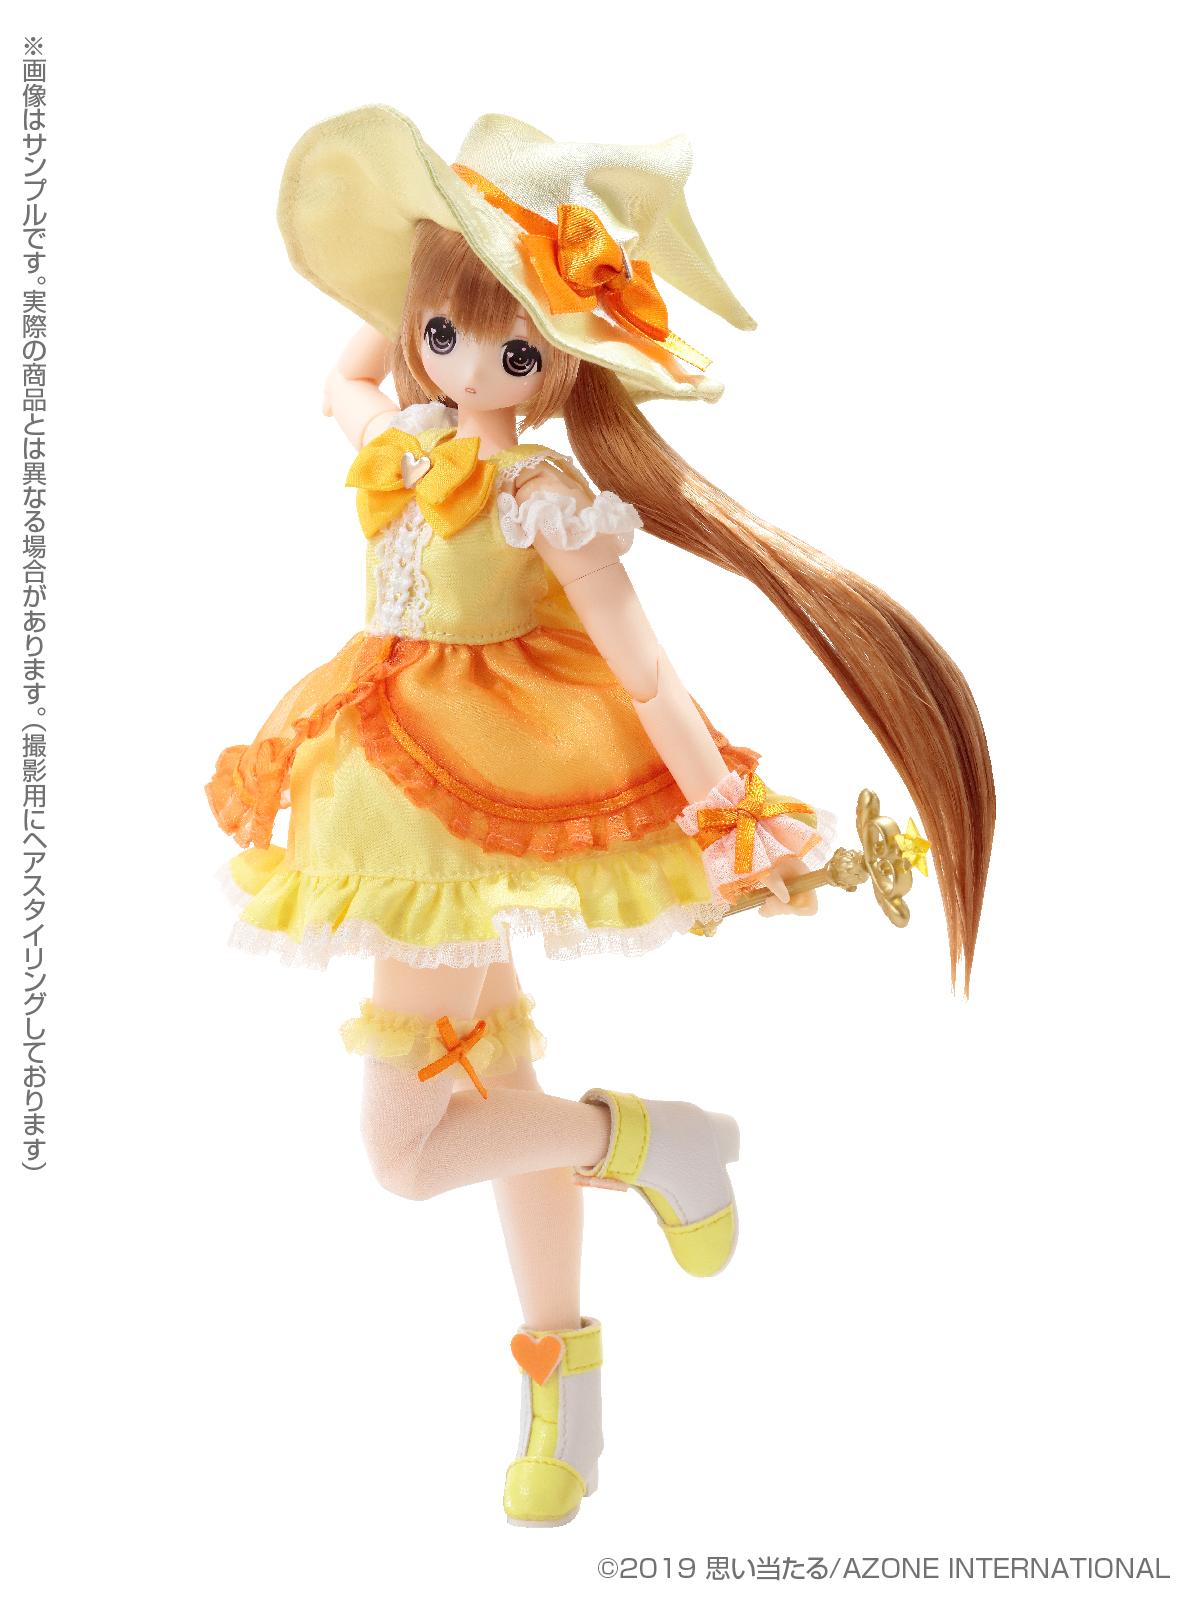 Magical☆CUTE『Pure Heart Chiika(ピュアハート ちいか)』えっくす☆きゅーと 1/6 完成品ドール-004